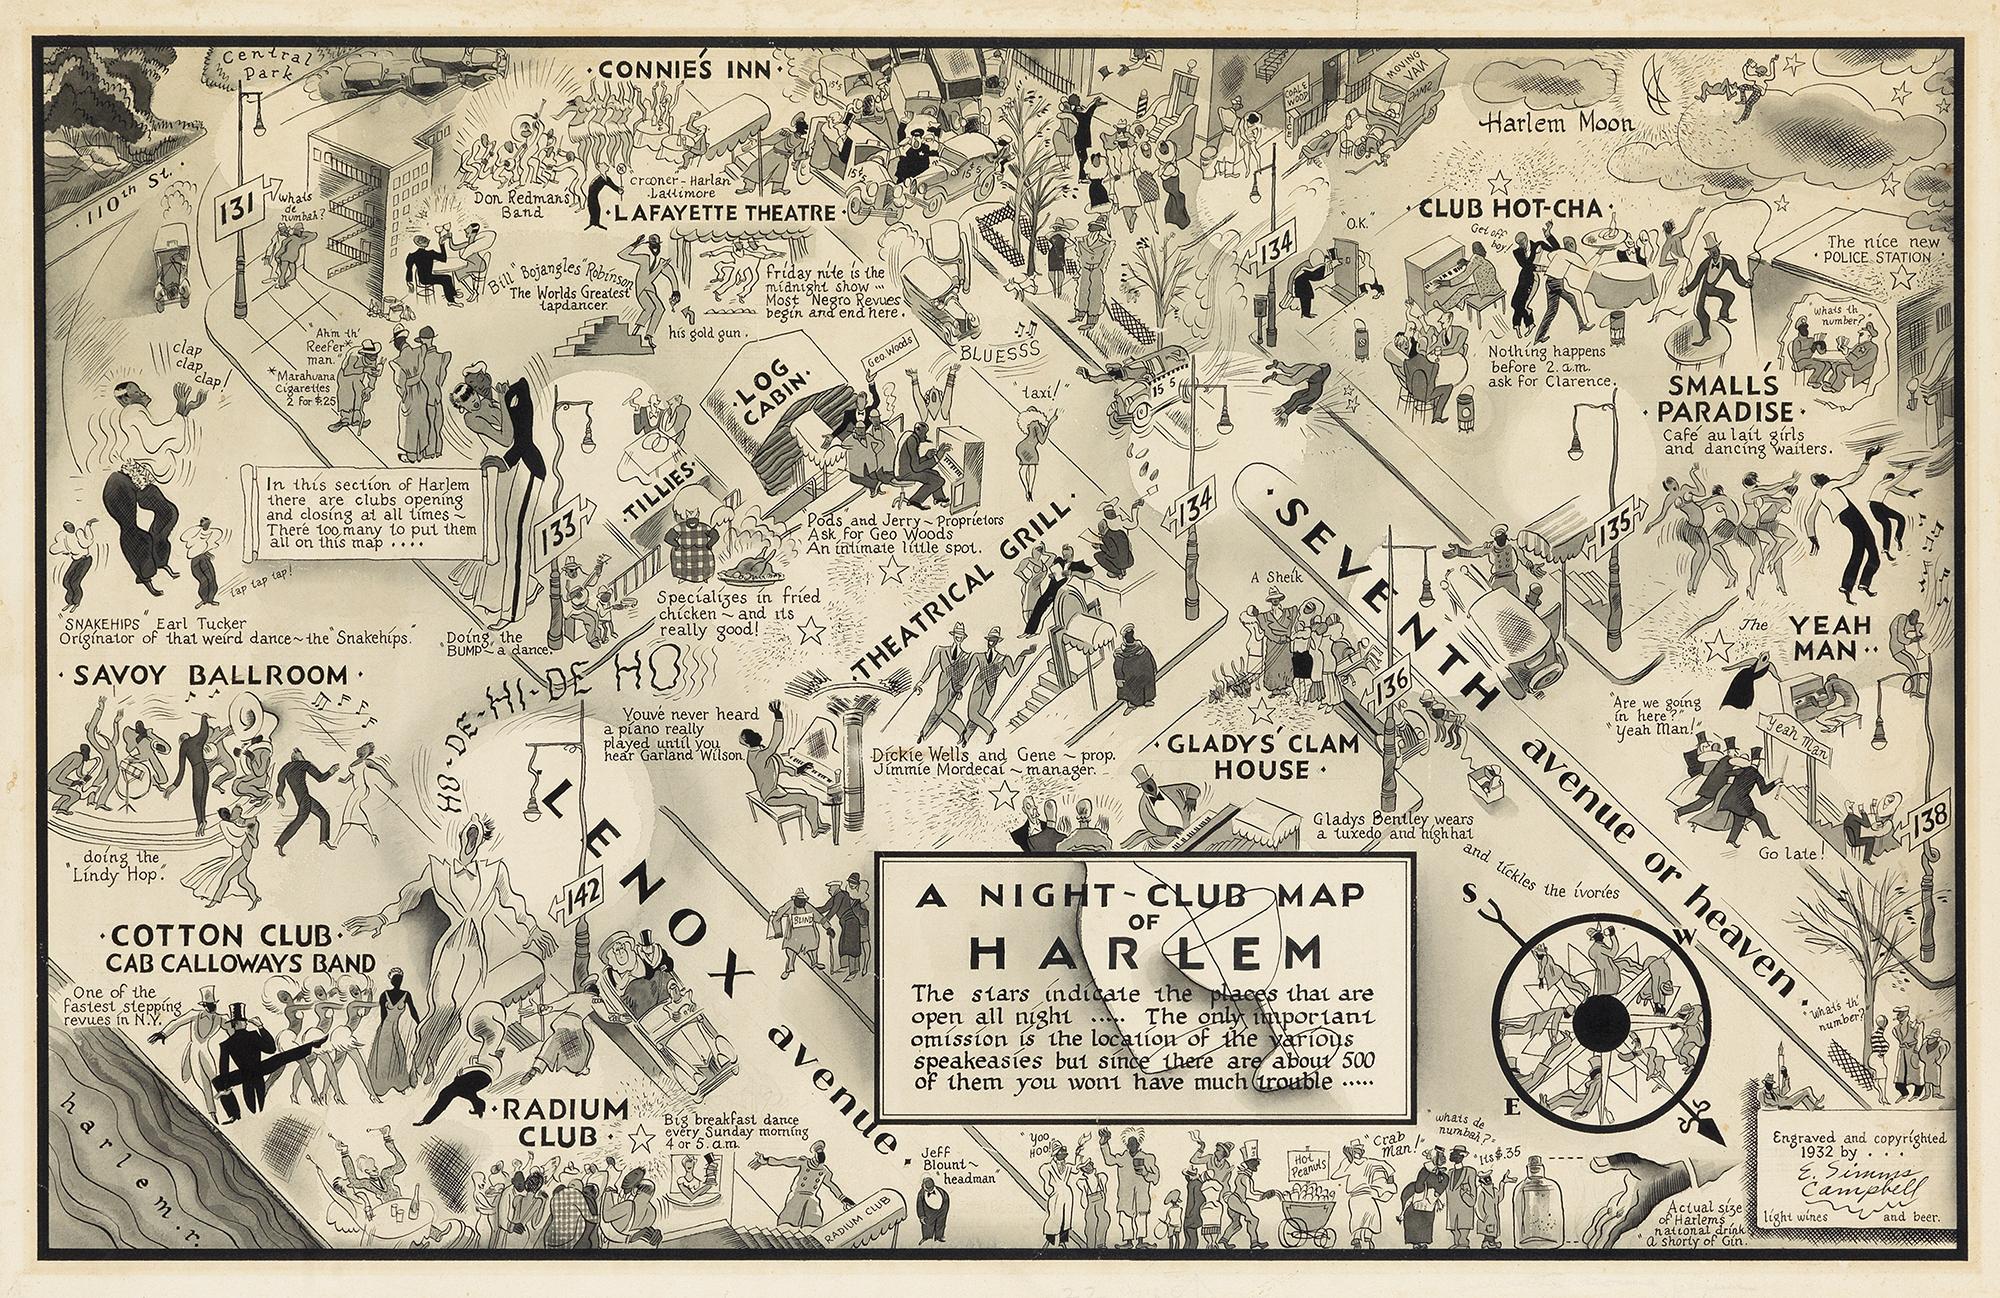 Night Club Map of Harlem